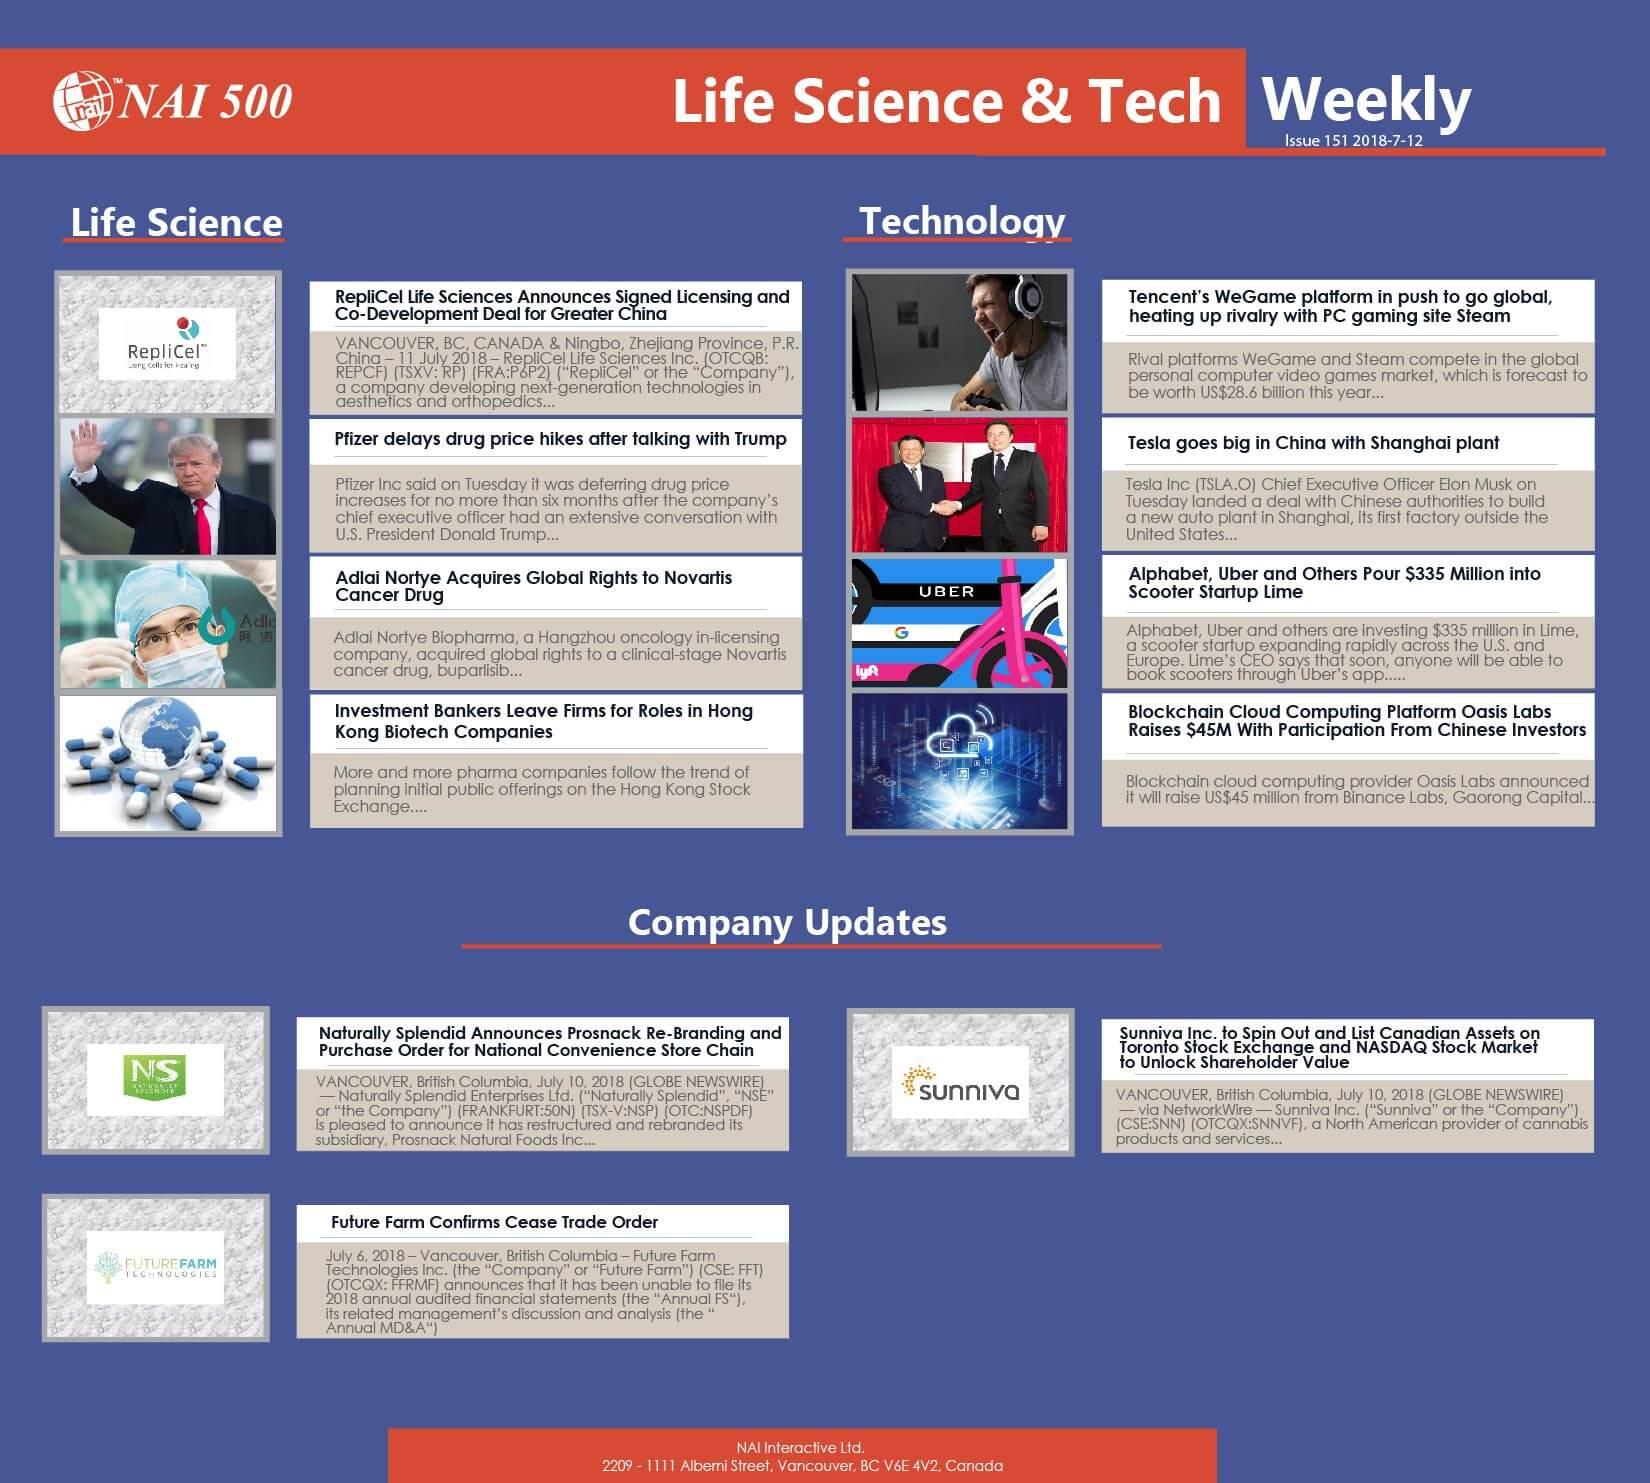 NAI500_Company_Life_Science_Weekly_Investment__Investors_July-12th_2018_Eng-01